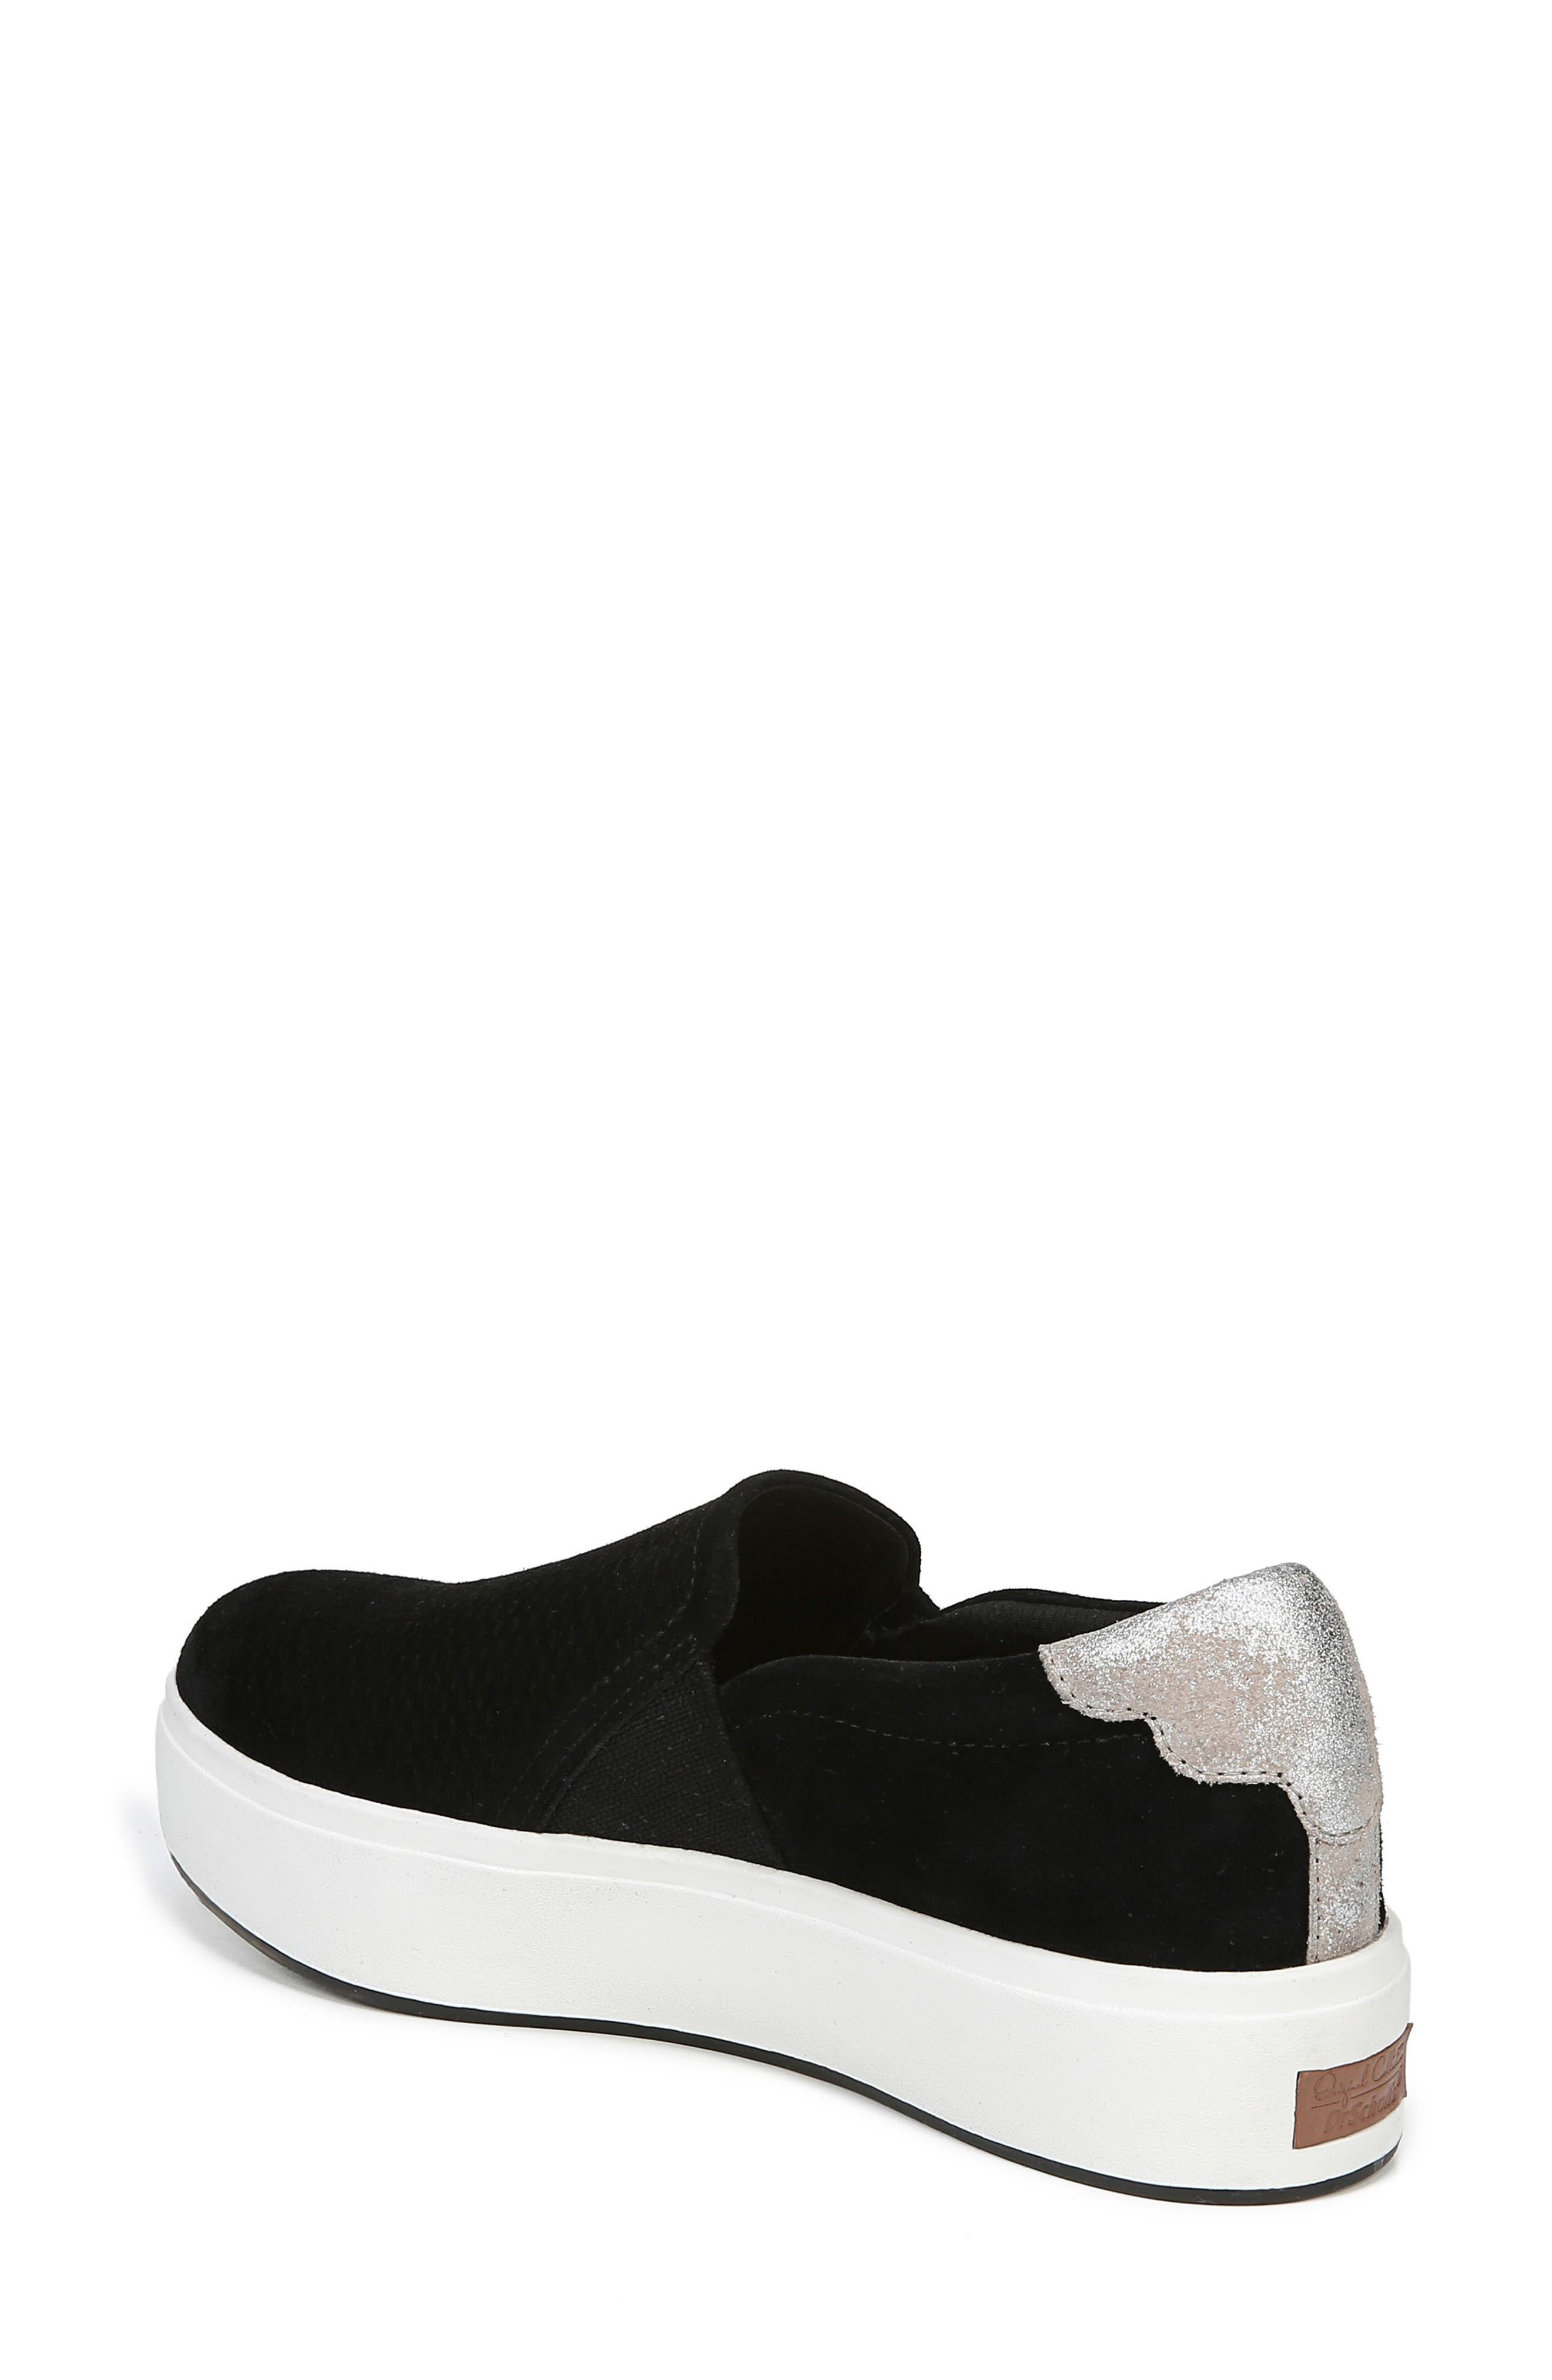 DR. SCHOLL'S, Abbot Lux Sneaker, Alternate thumbnail 2, color, BLACK SUEDE